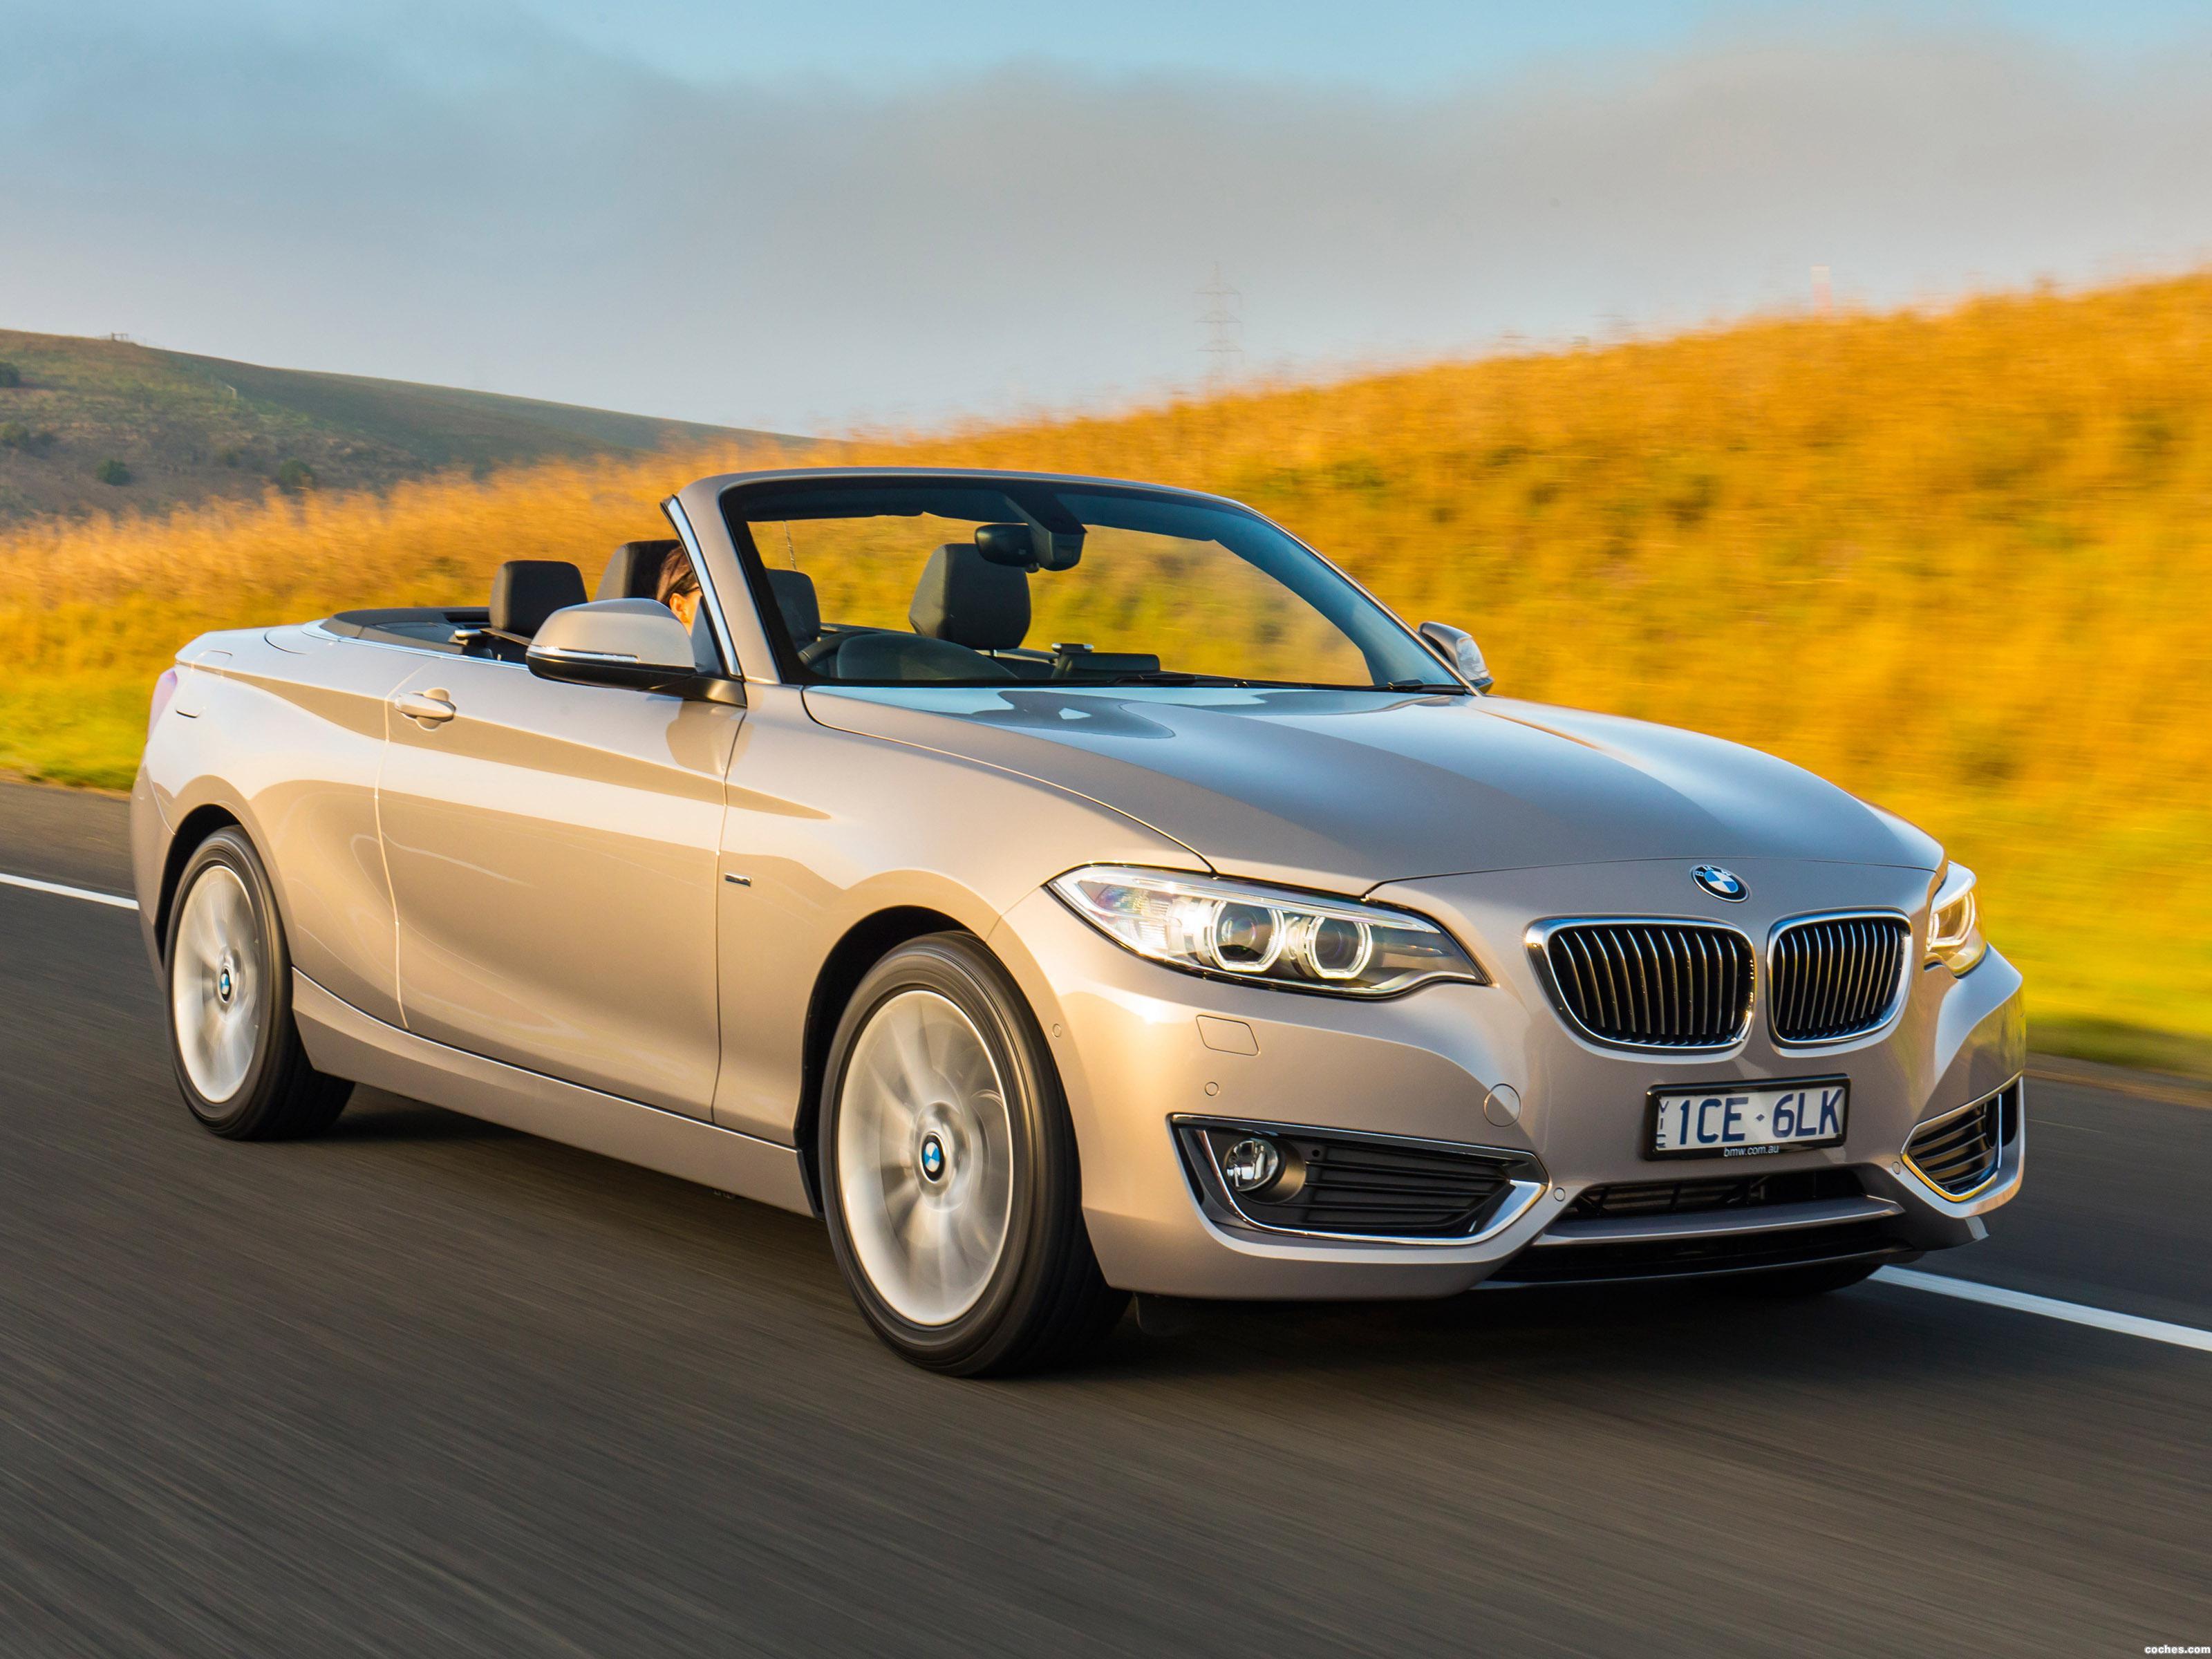 bmw_2-series-220i-cabrio-luxury-line-f23-australia-2015_r10.jpg